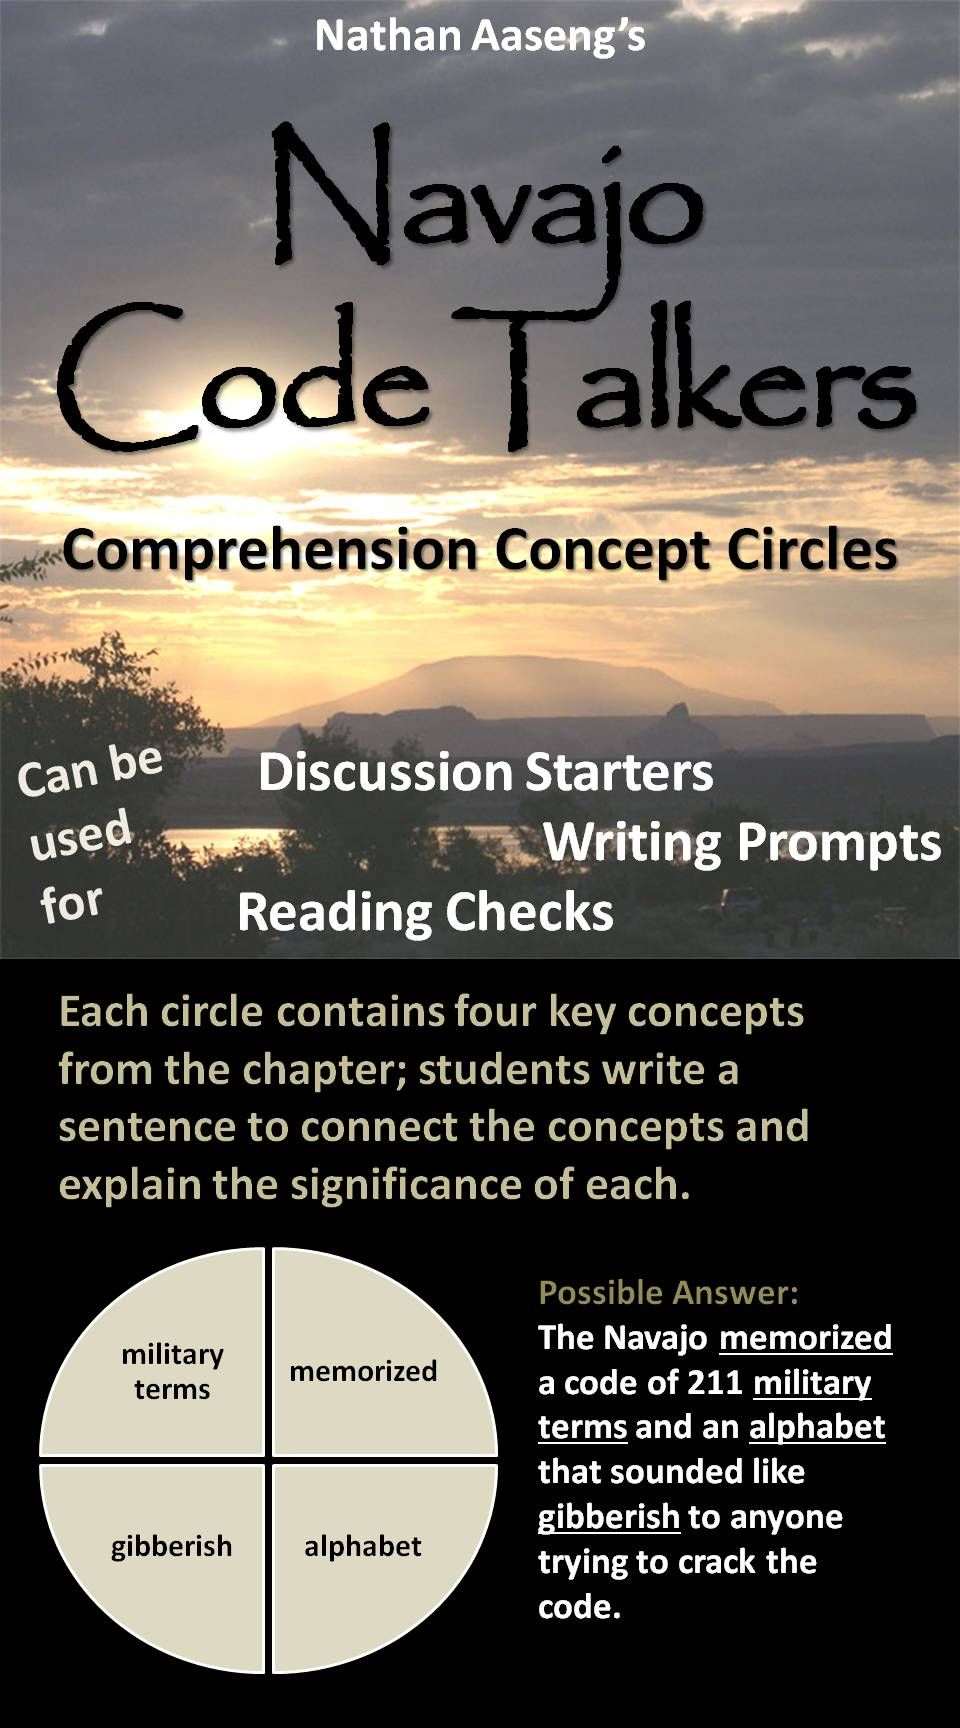 Activity to accompany Nathan Aaseng's Navajo Code Talkers.